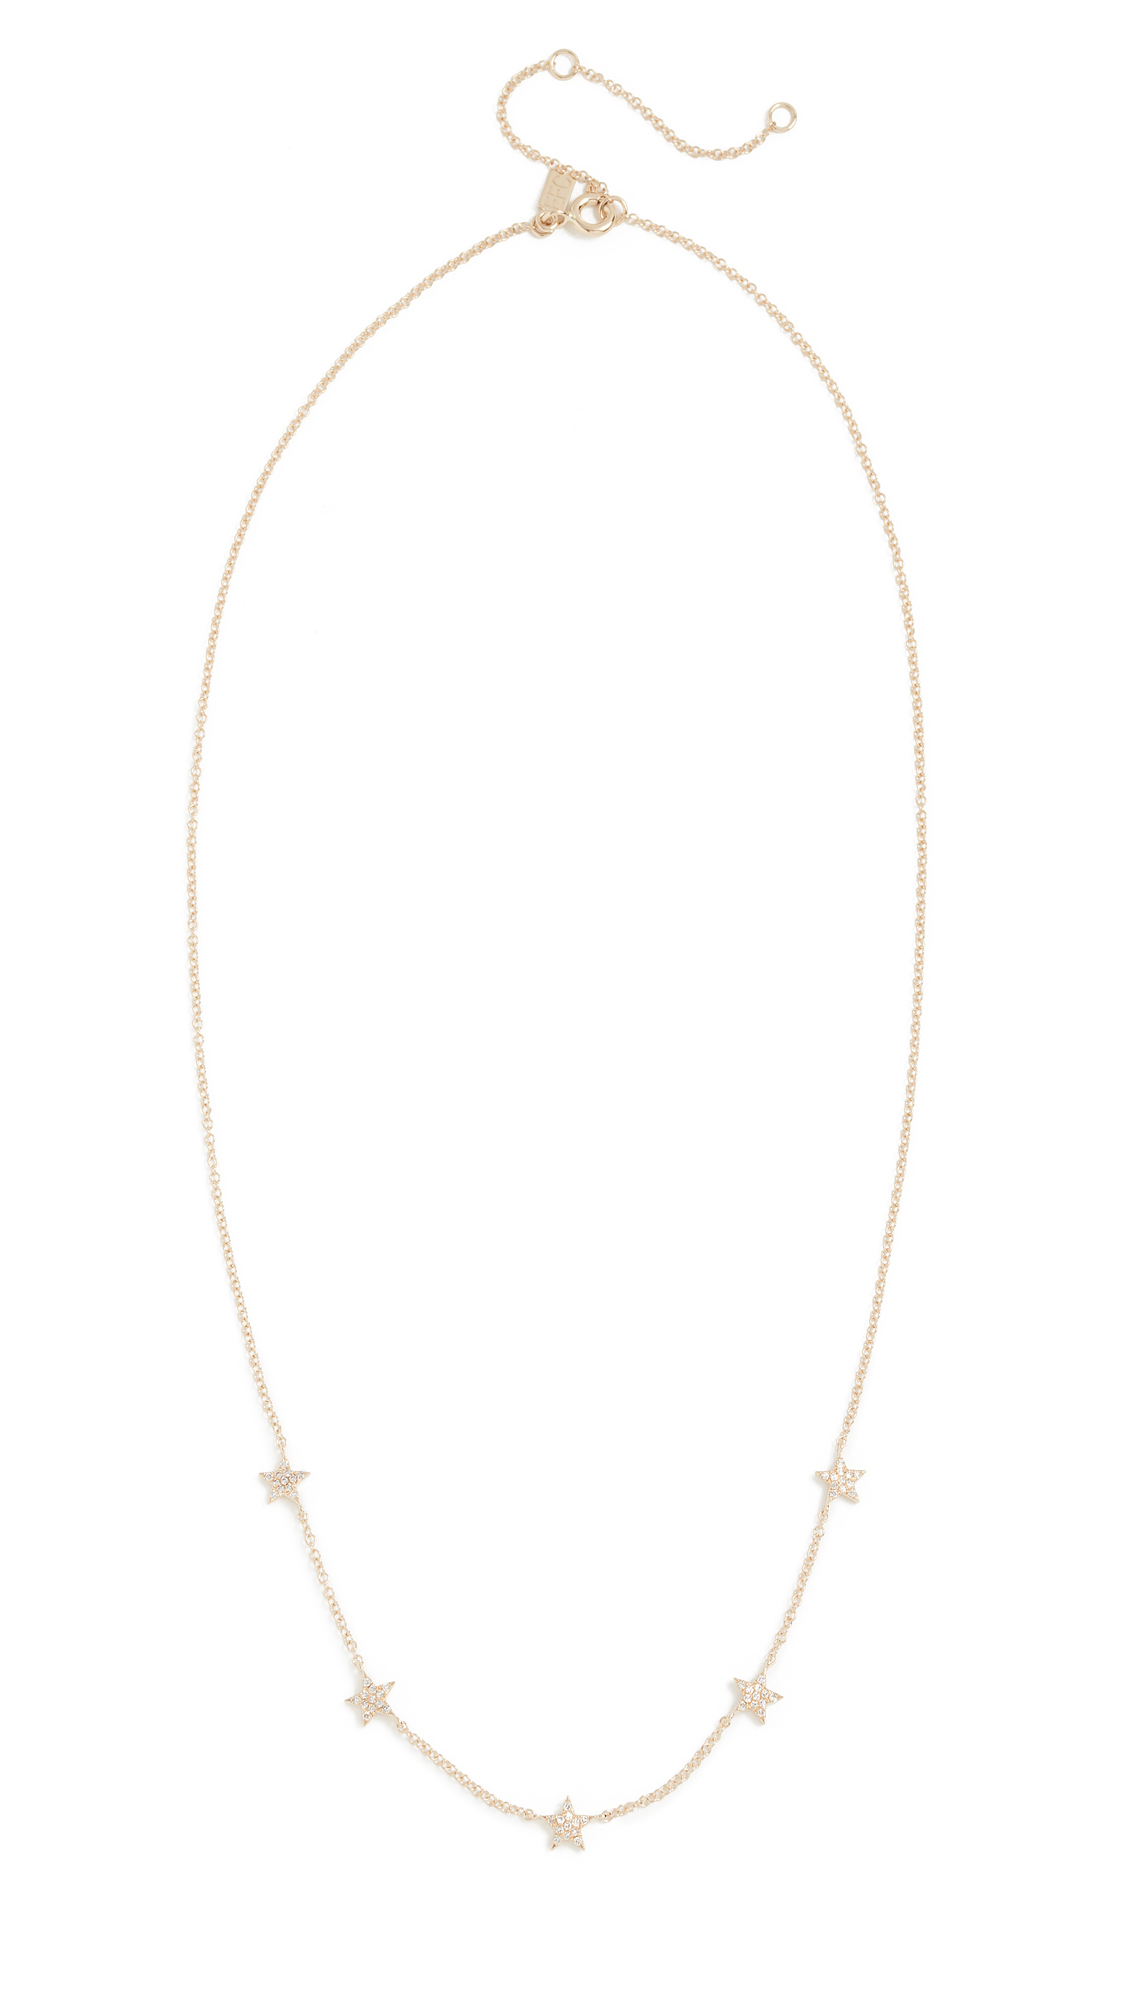 EF Collection 14k Gold Diamond 5 Mini Star Necklace lHz4vI0